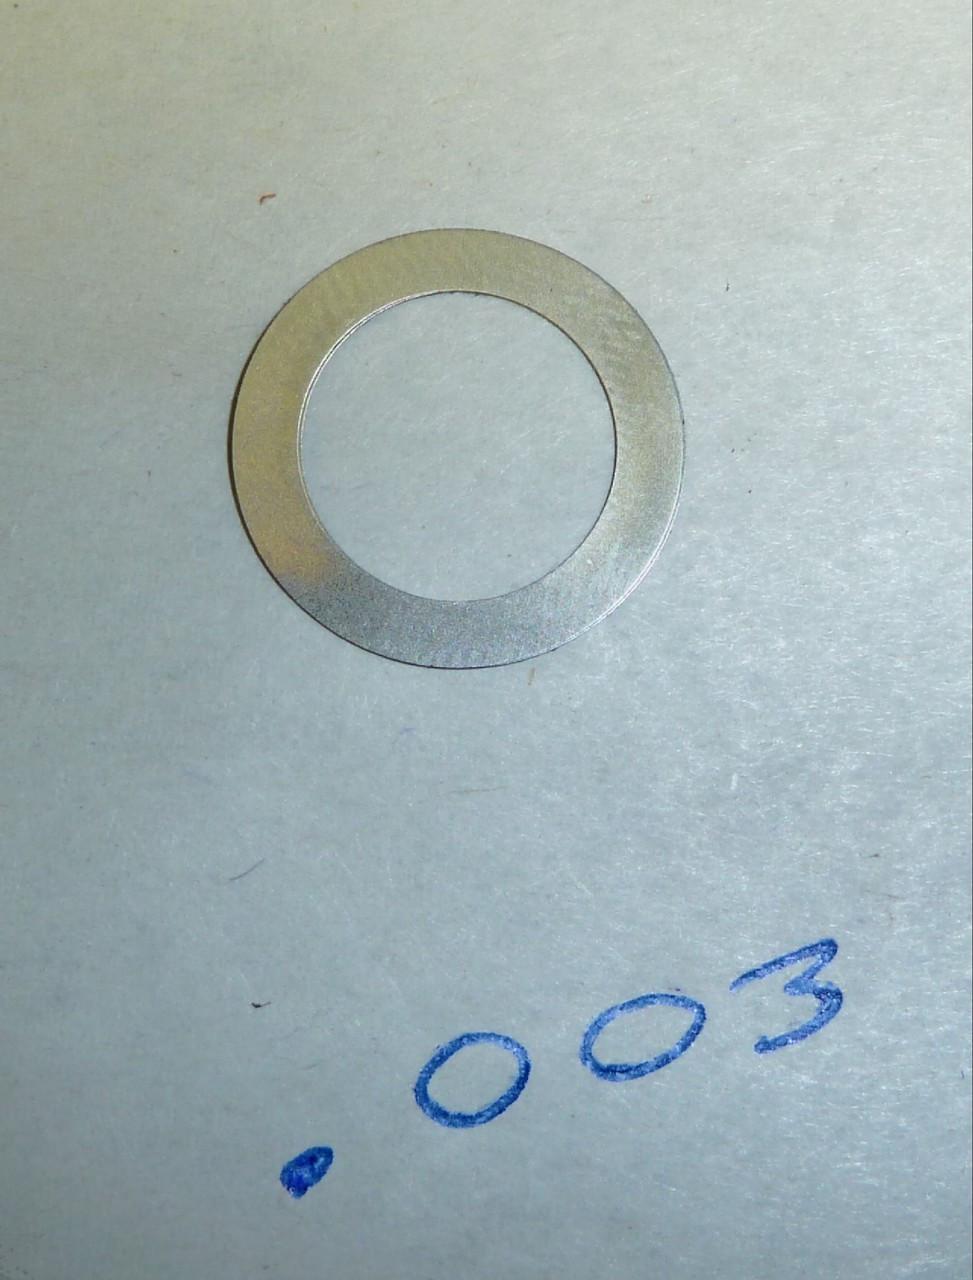 Vickers Lock Headspacing Washer (repro), No. 1 .003 thickness